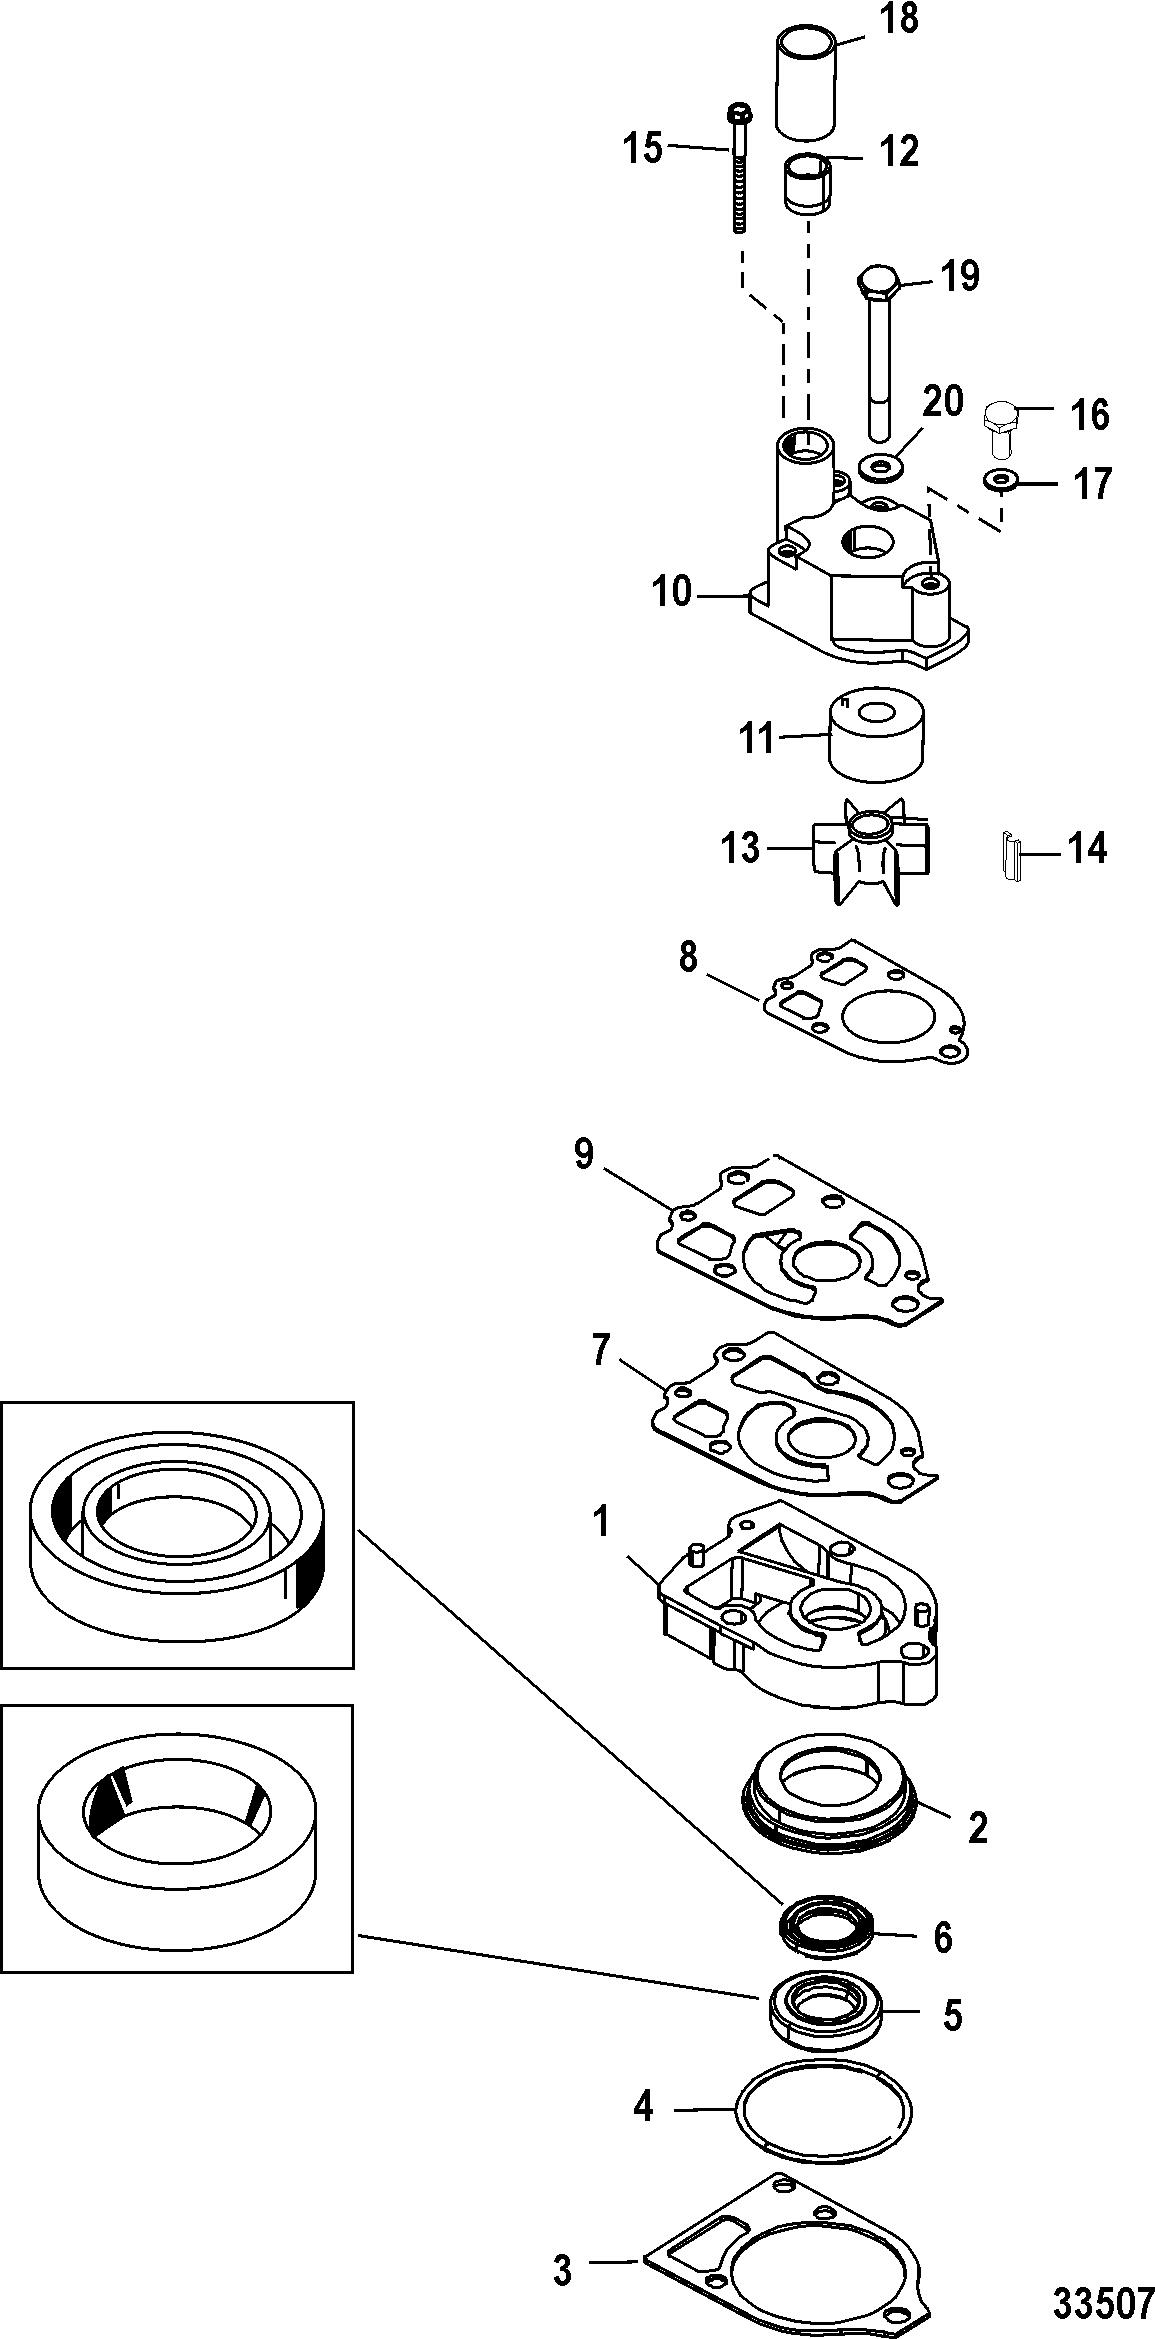 Water Pump Kit, Jet FOR MARINER / MERCURY 135/150/175 DFI